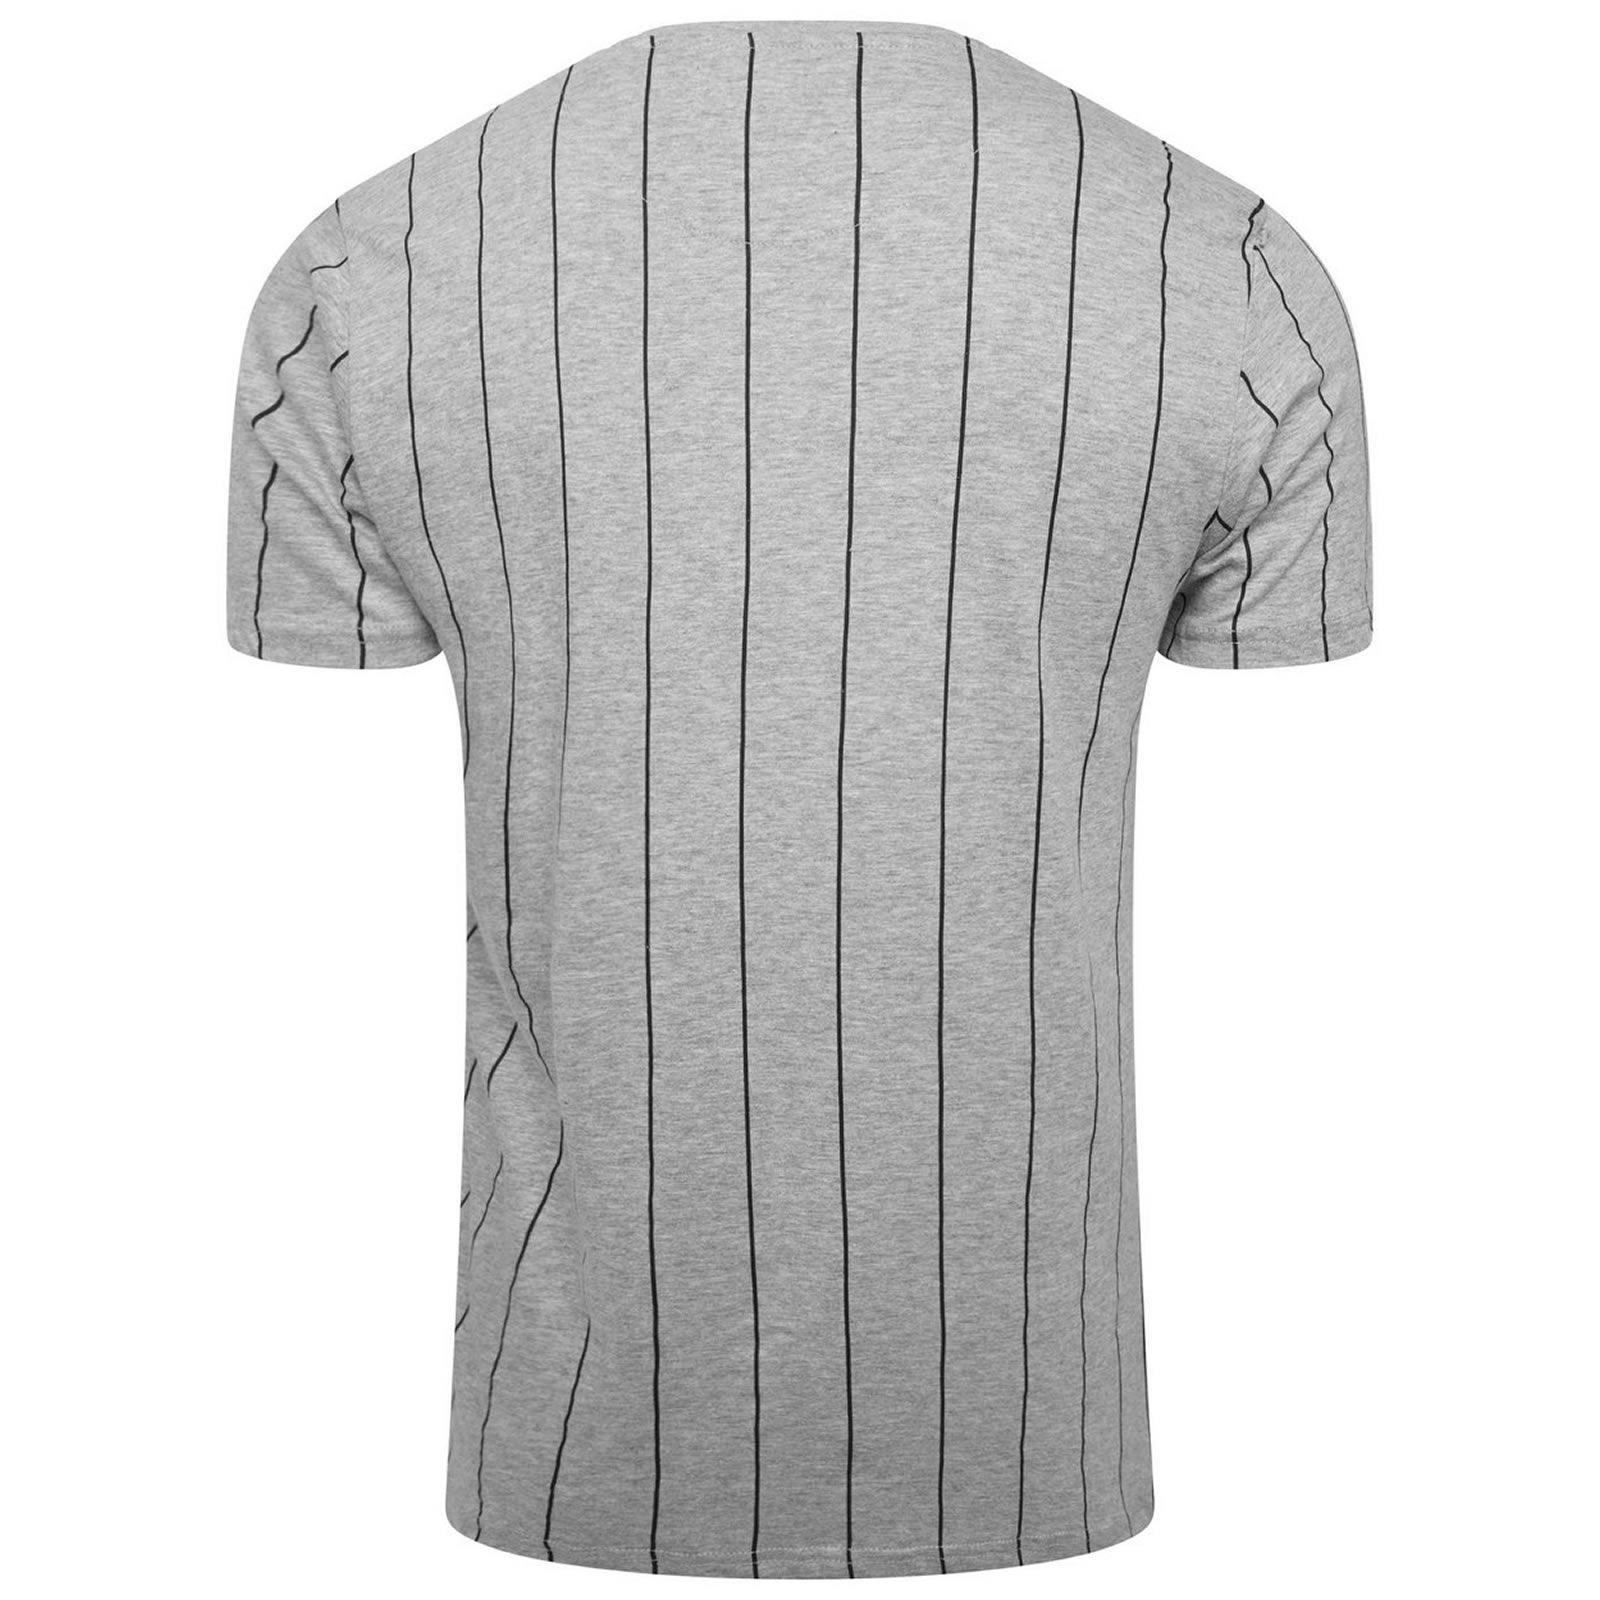 Hommes-T-Shirt-Brave-Soul-Stobart-a-encolure-ras-du-cou-a-manches-courtes-a-rayures-verticales-Tee miniature 3